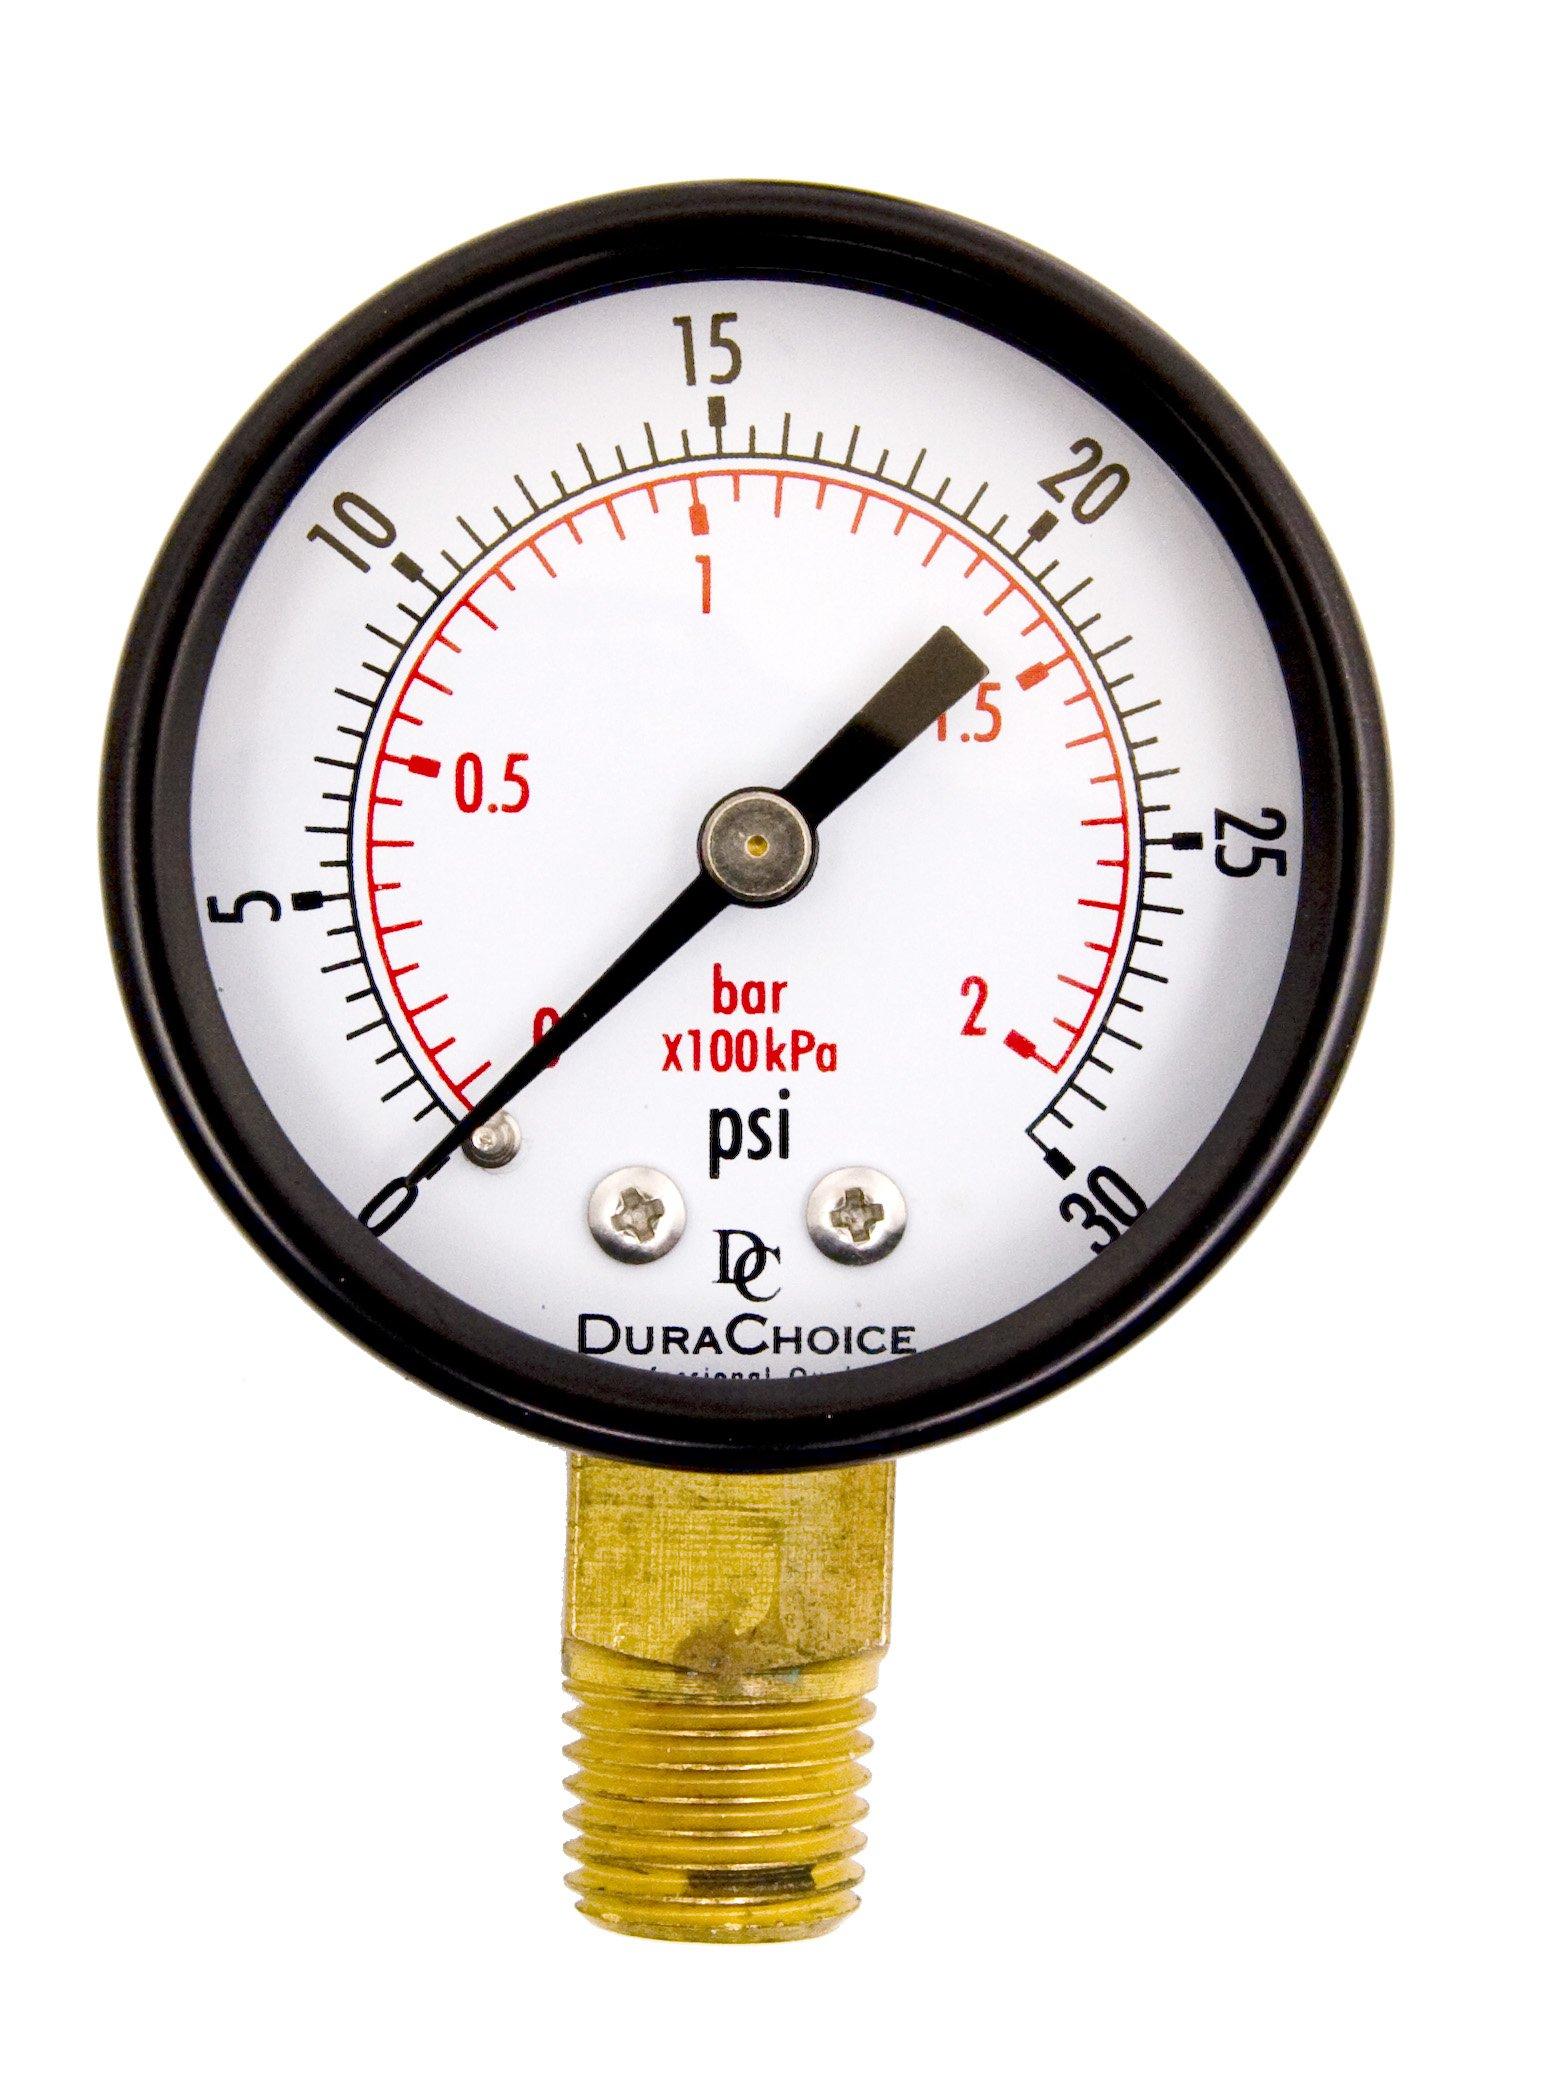 2'' Pool Spa Filter Utility Pressure Gauge for Water, Oil, Gas, 1/4'' NPT Lower Mount, Black Steel Case, 0-30PSI